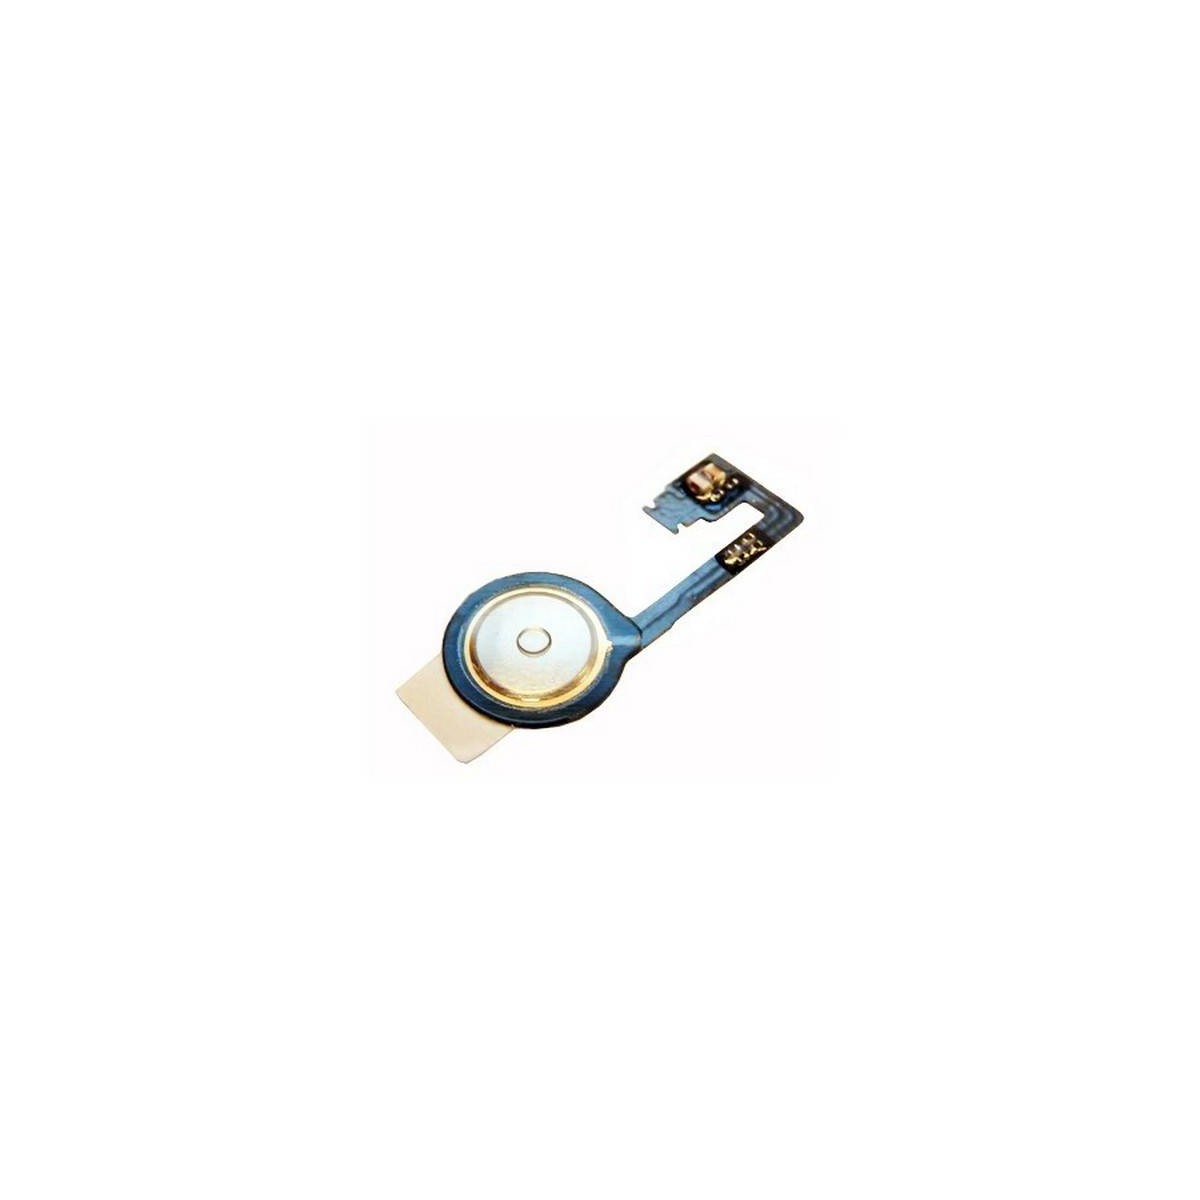 iPhone 4S cabo flex com interruptor Home